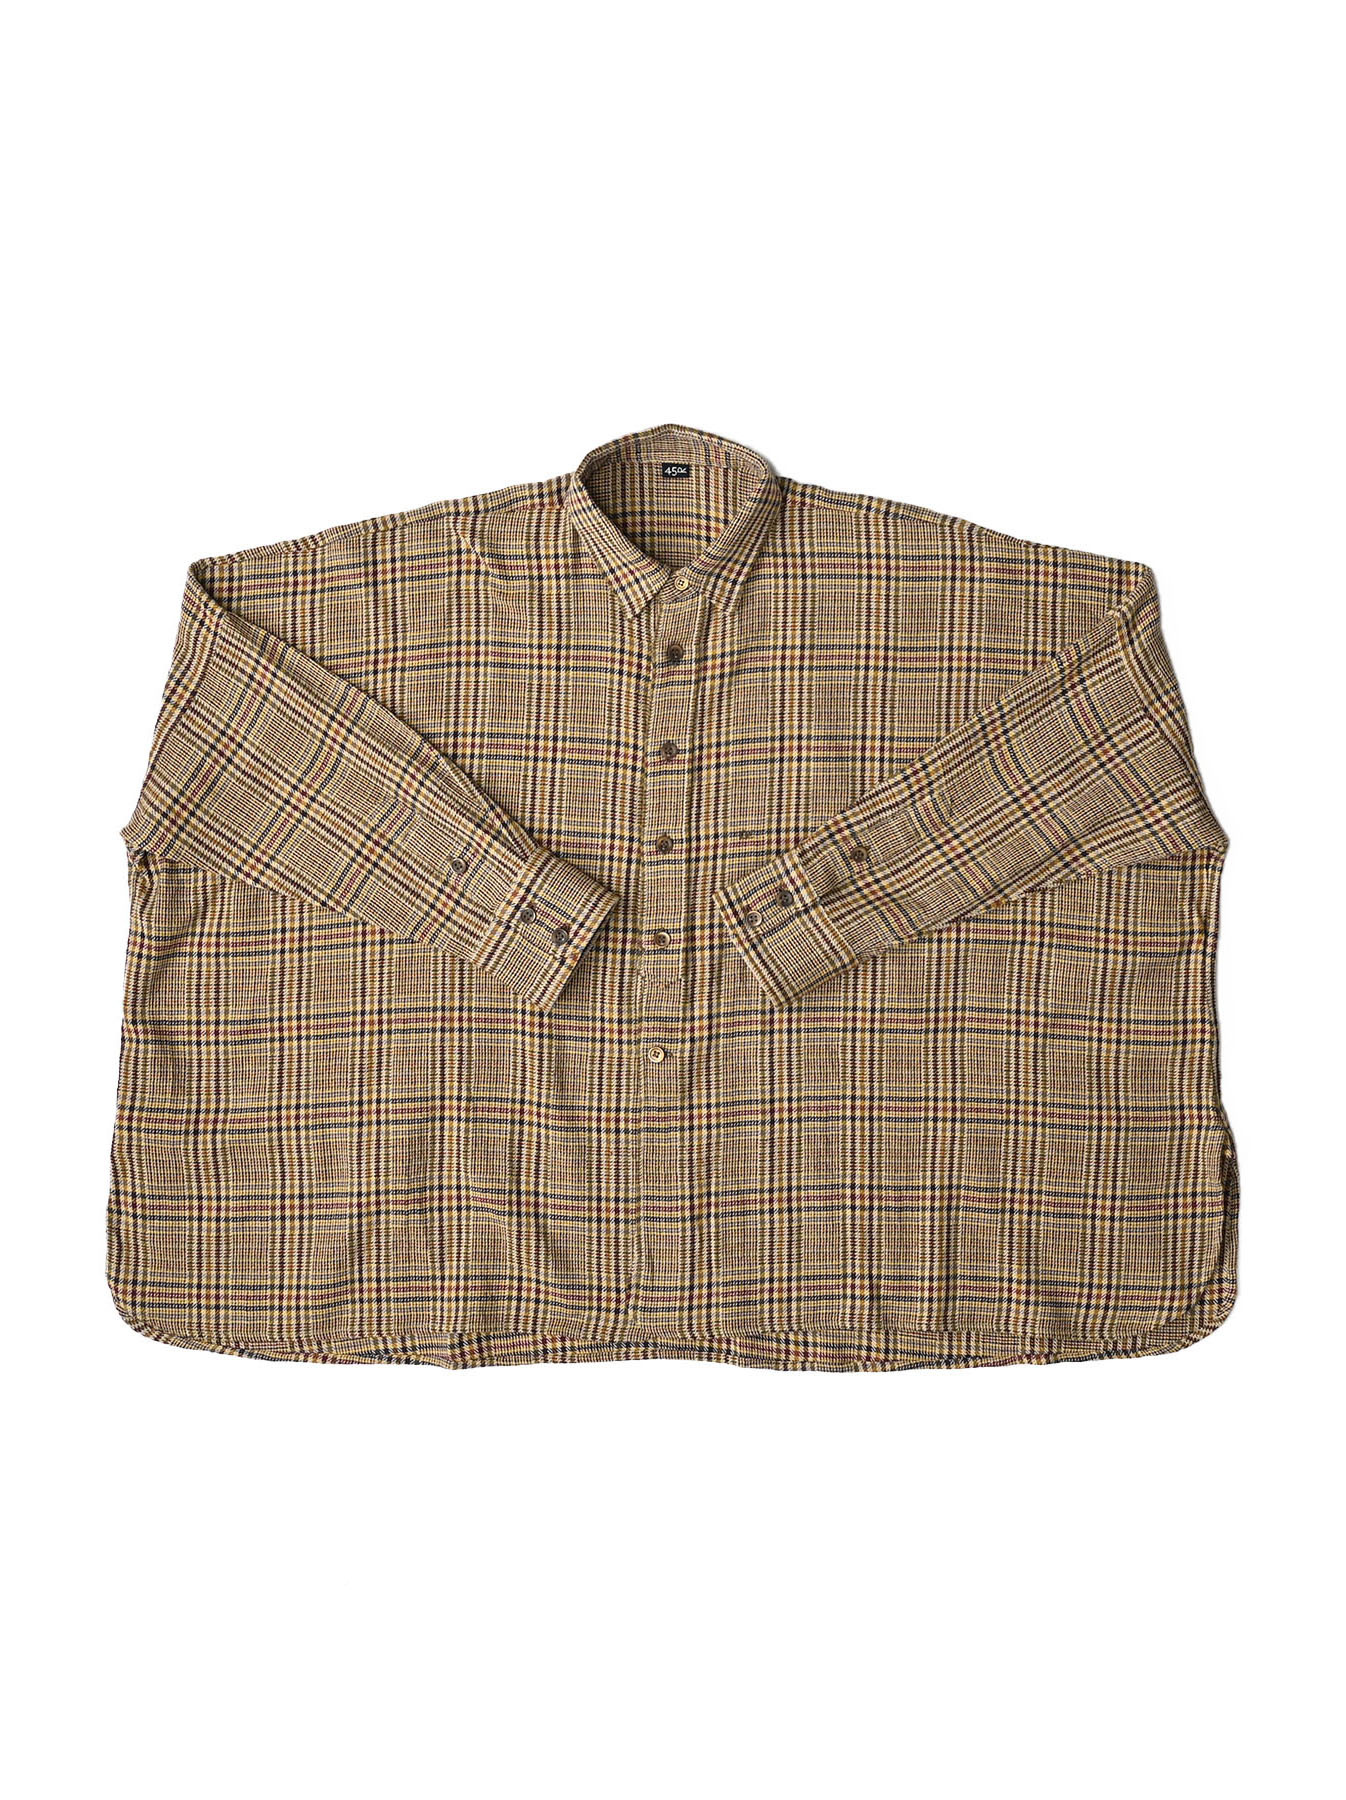 Indian Flannel Big Shirt-1